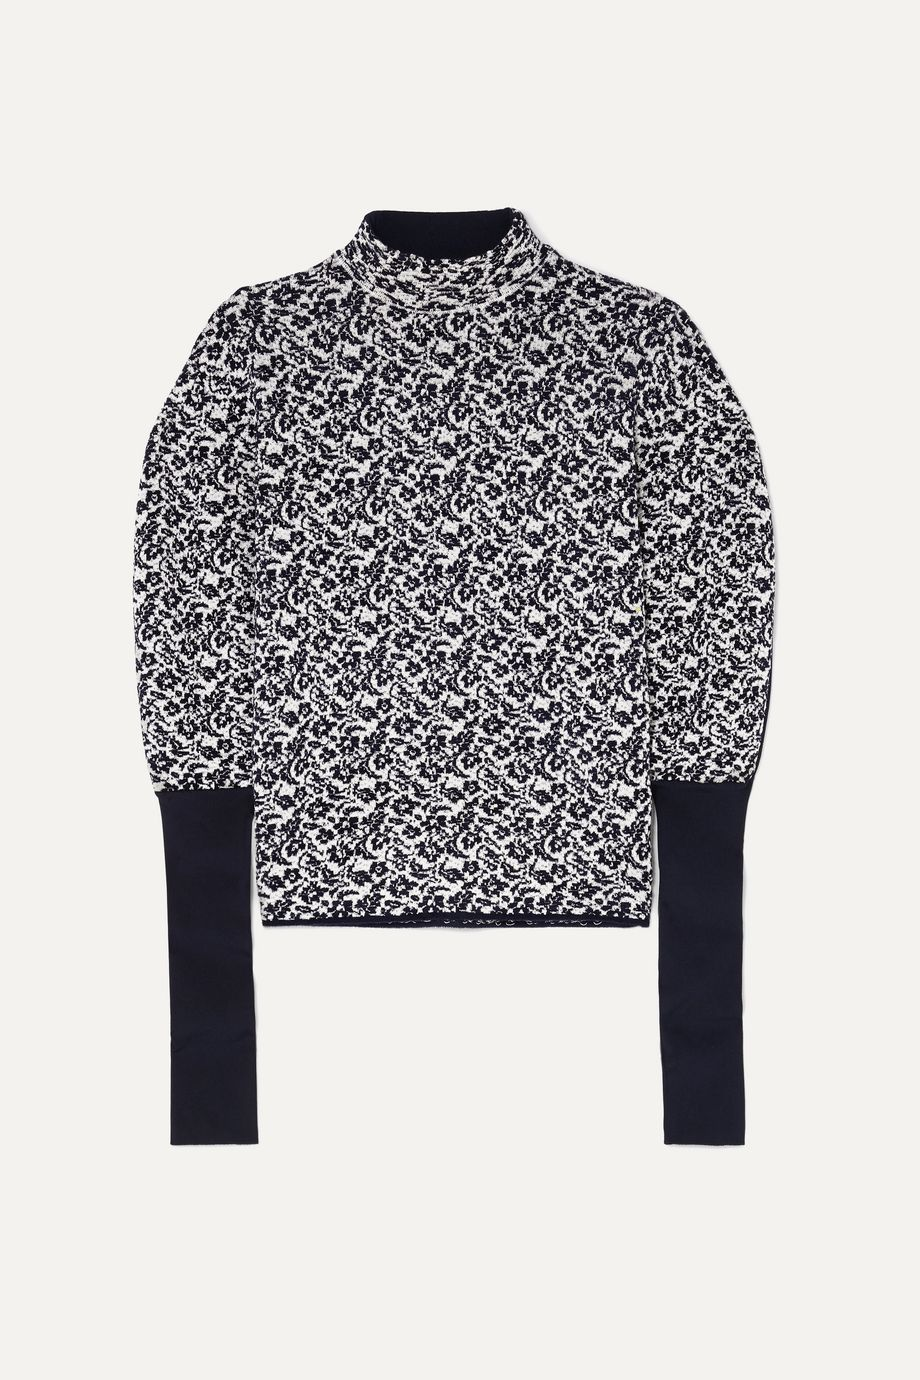 Chloé Floral-jacquard sweater